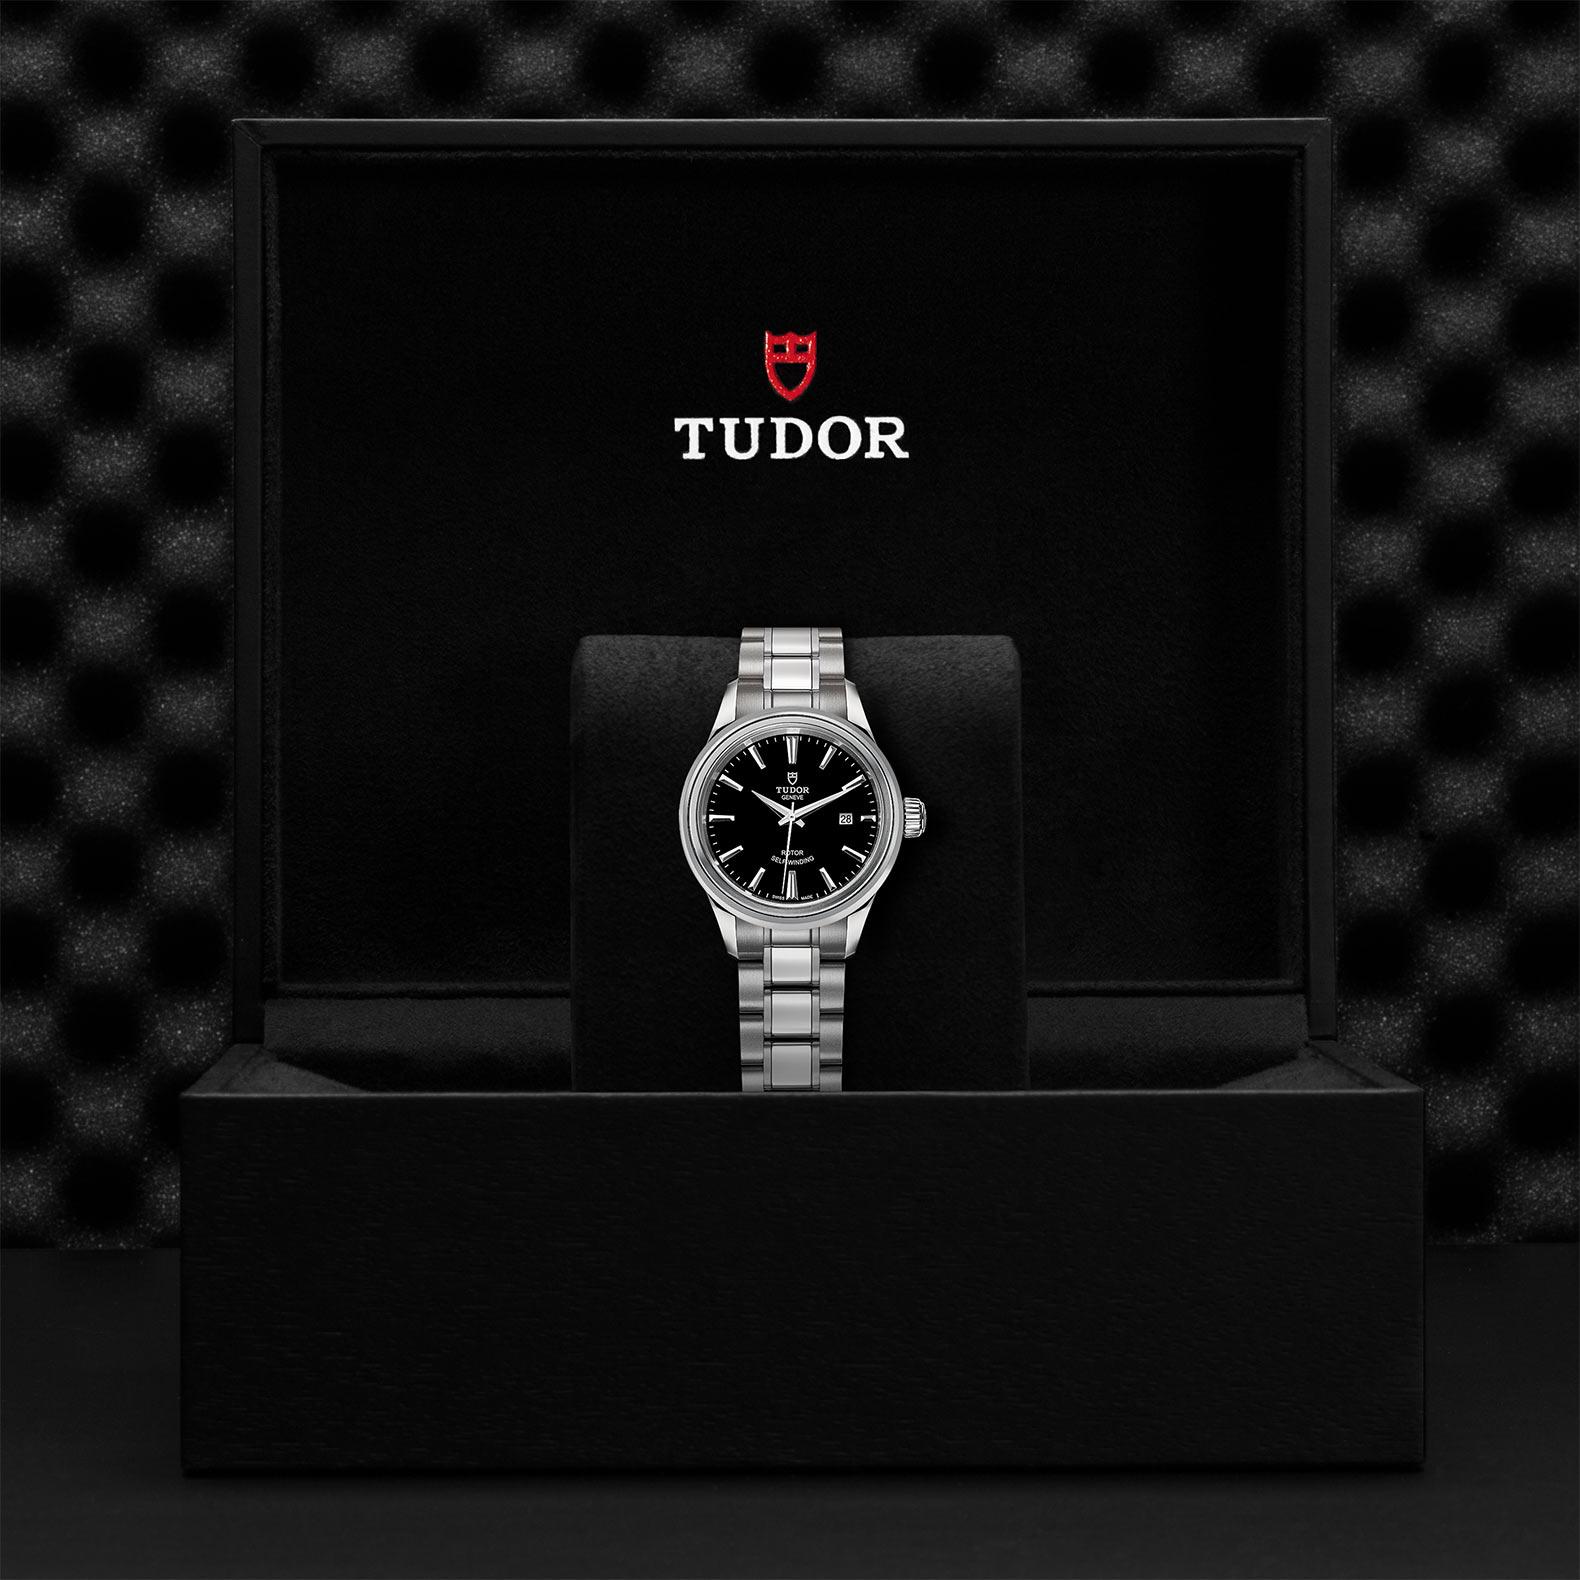 TUDOR Style M12100 0002 Presentation